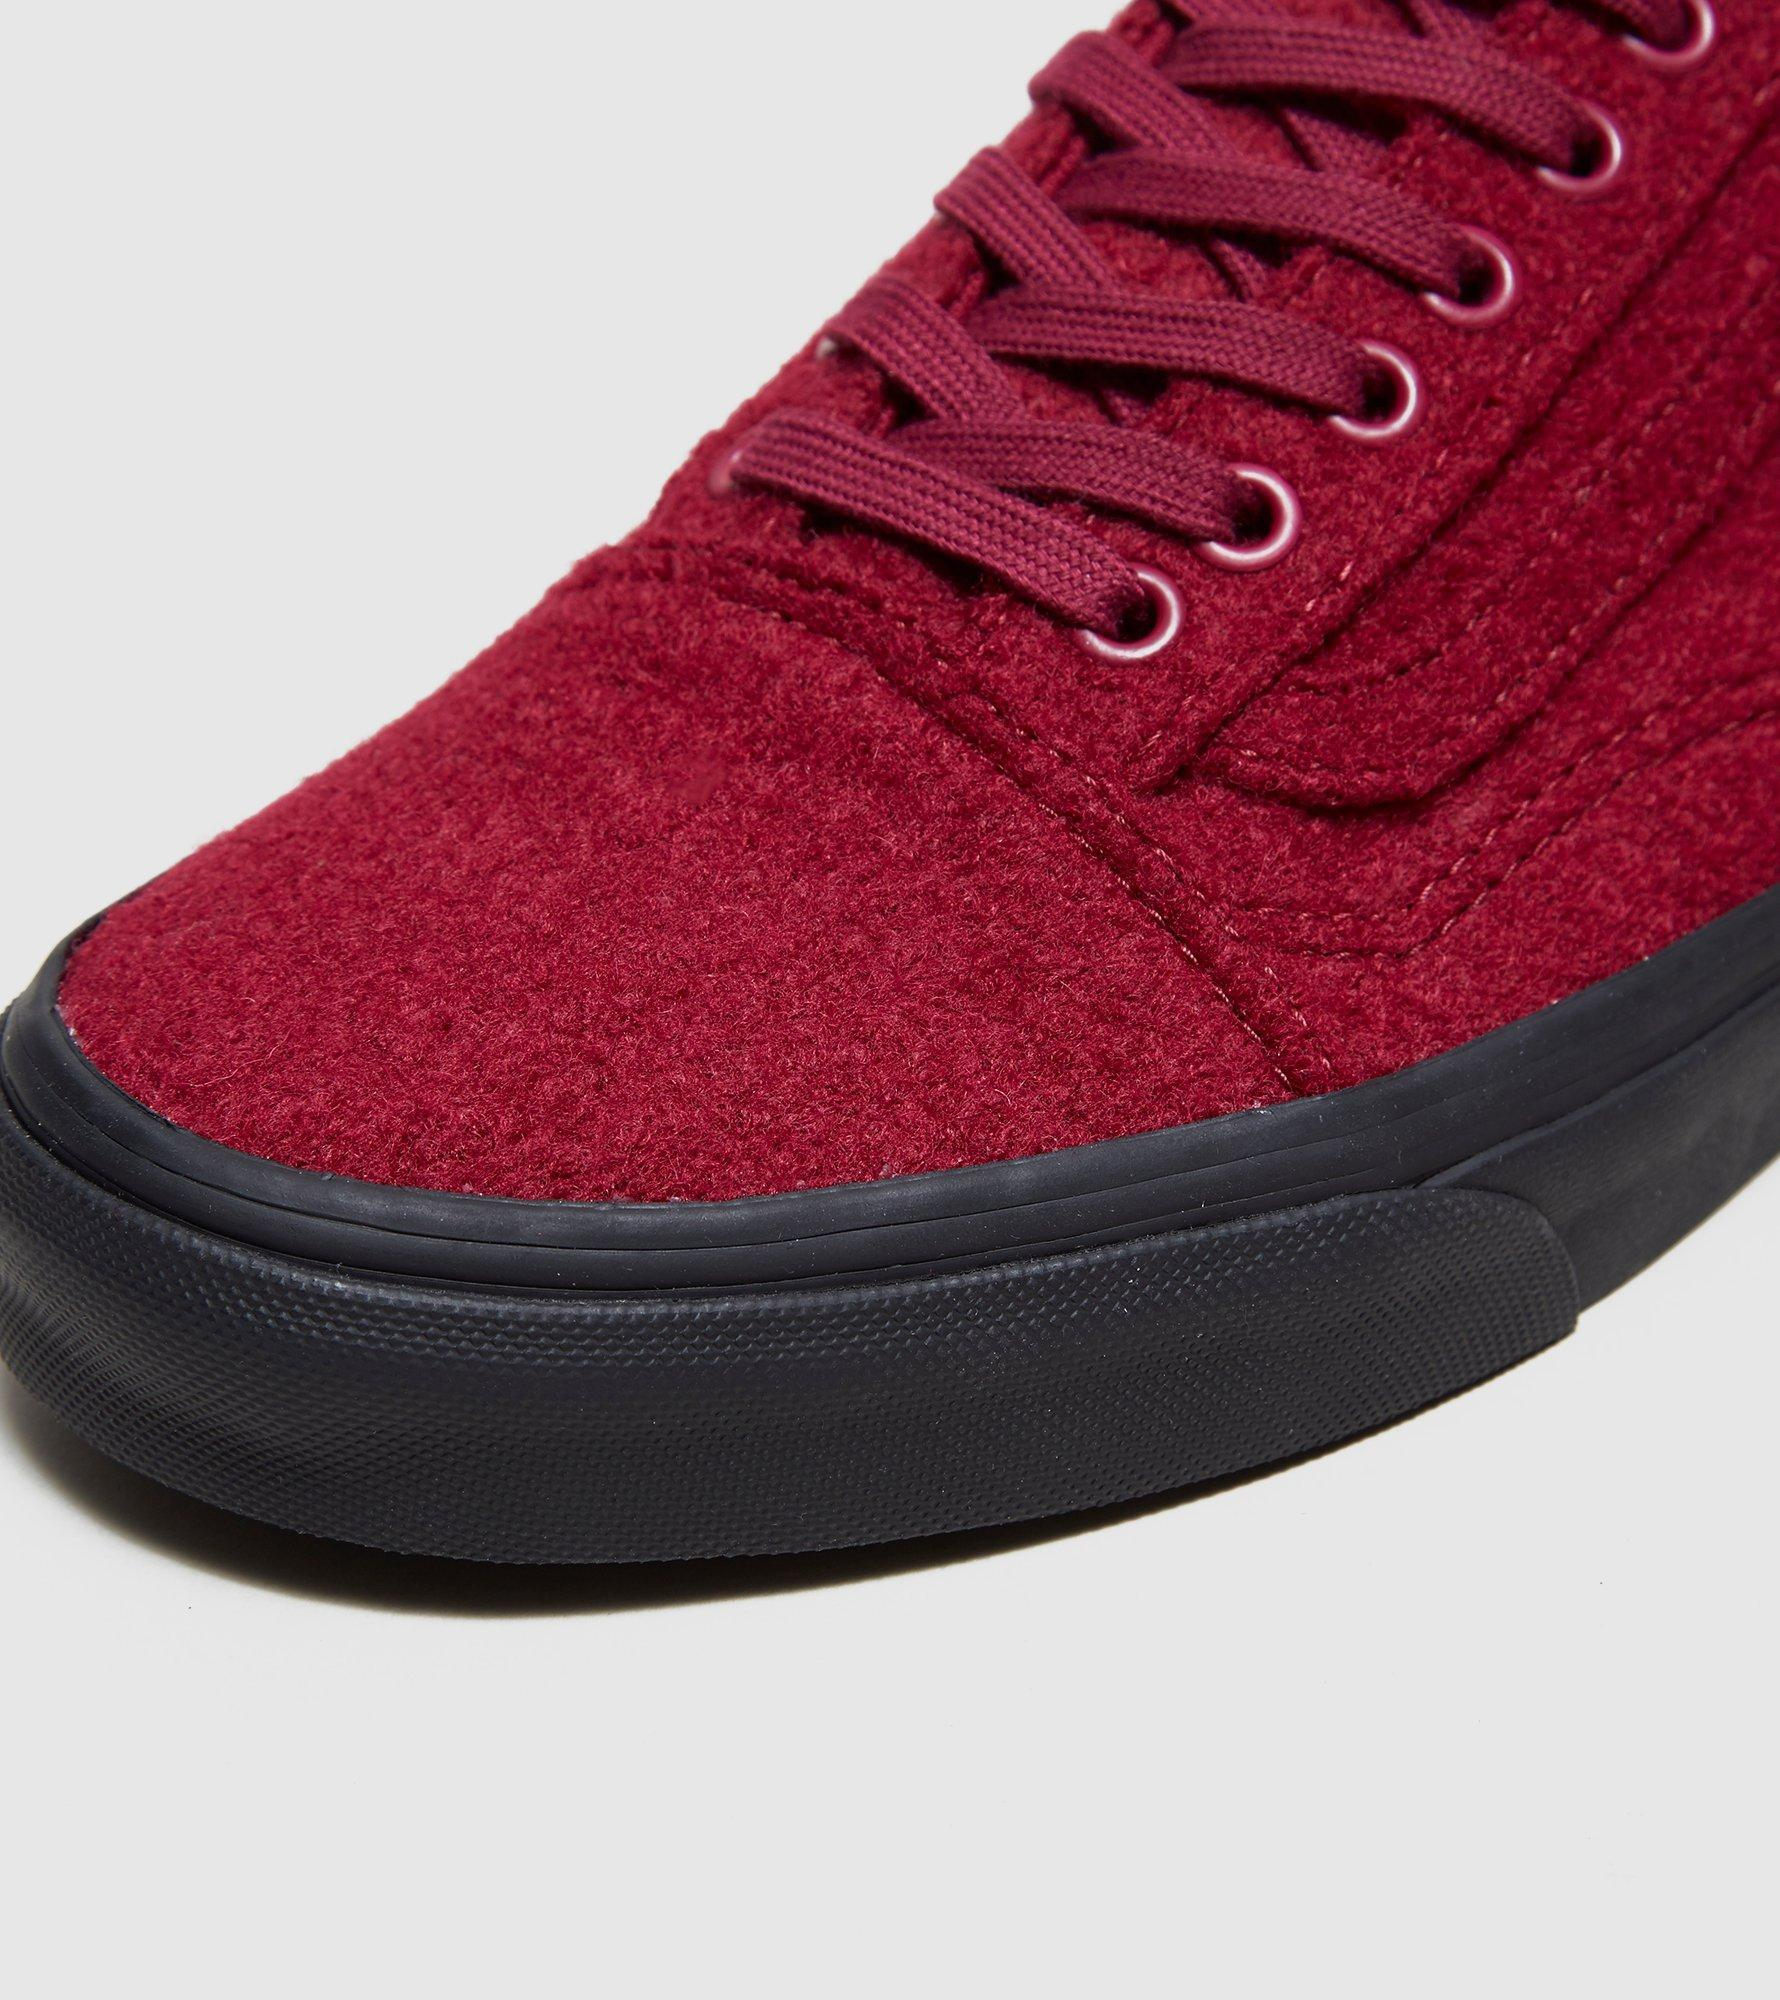 Bespoke Vans Shoes